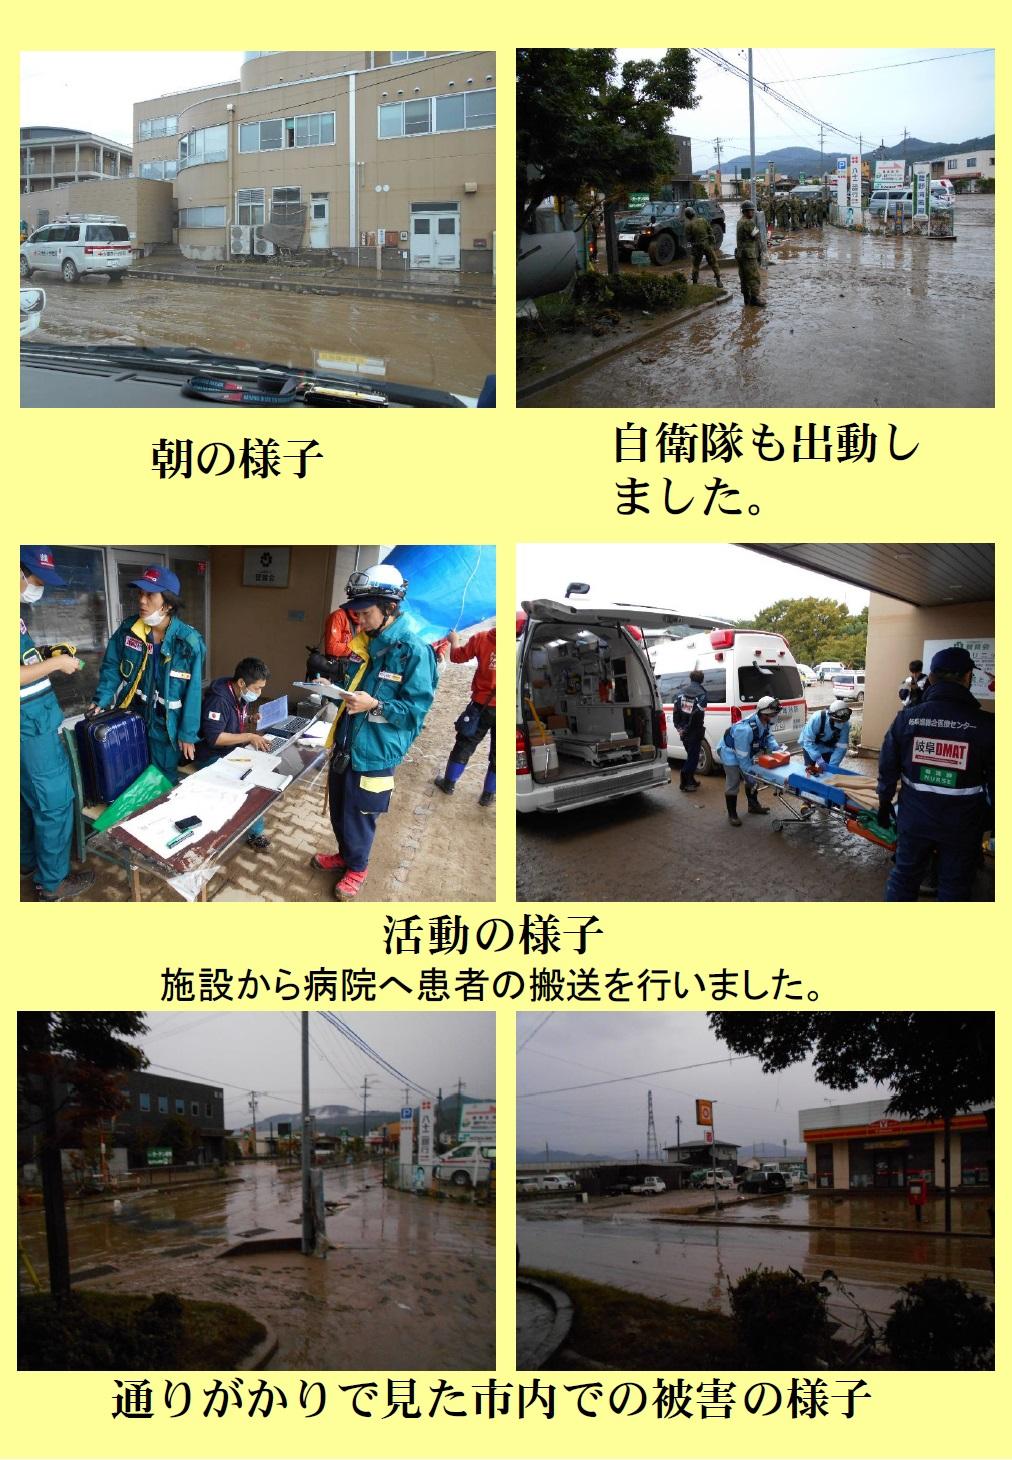 http://nakatsugawa-hp.jp/dmat/images/DMAT%E6%B4%BB%E5%8B%95%E5%A0%B1%E5%91%8A2019%E2%91%A1.jpg